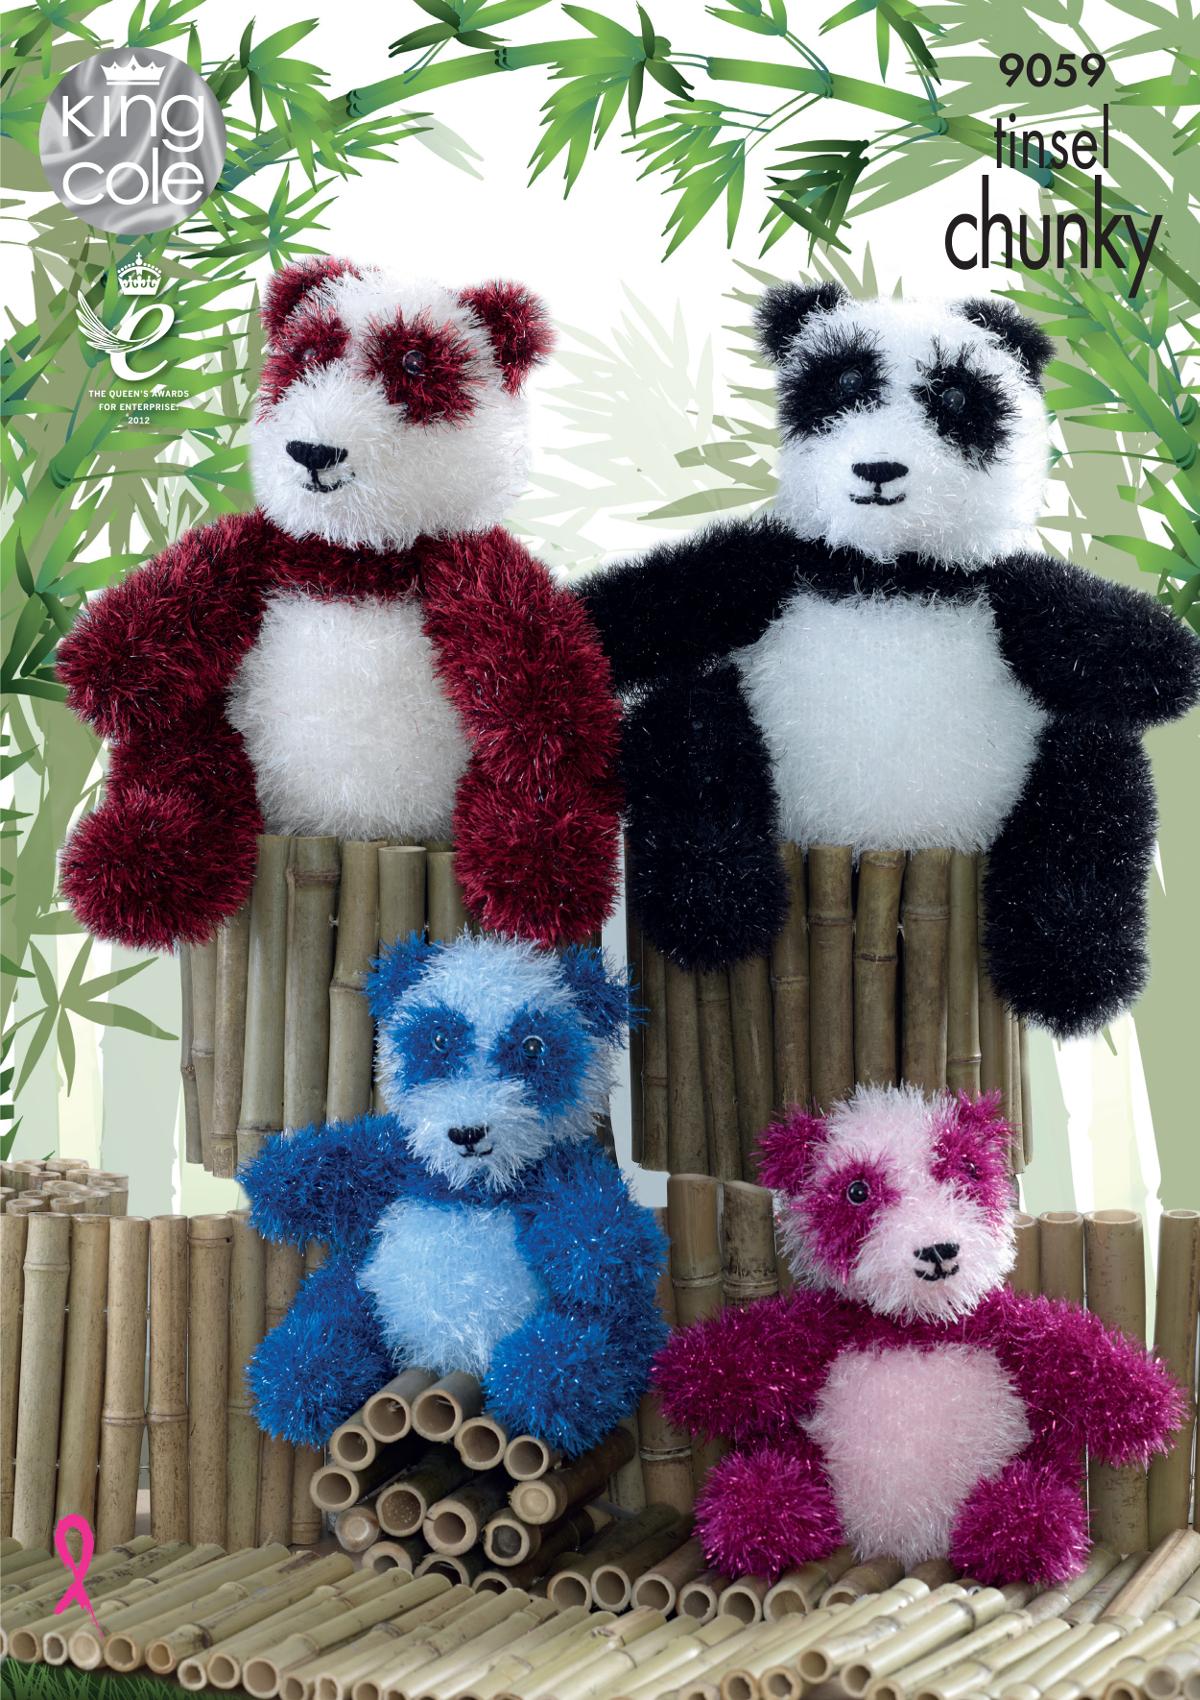 King Cole Tinsel Chunky Knitting Pattern Small or Large Panda Bear ...